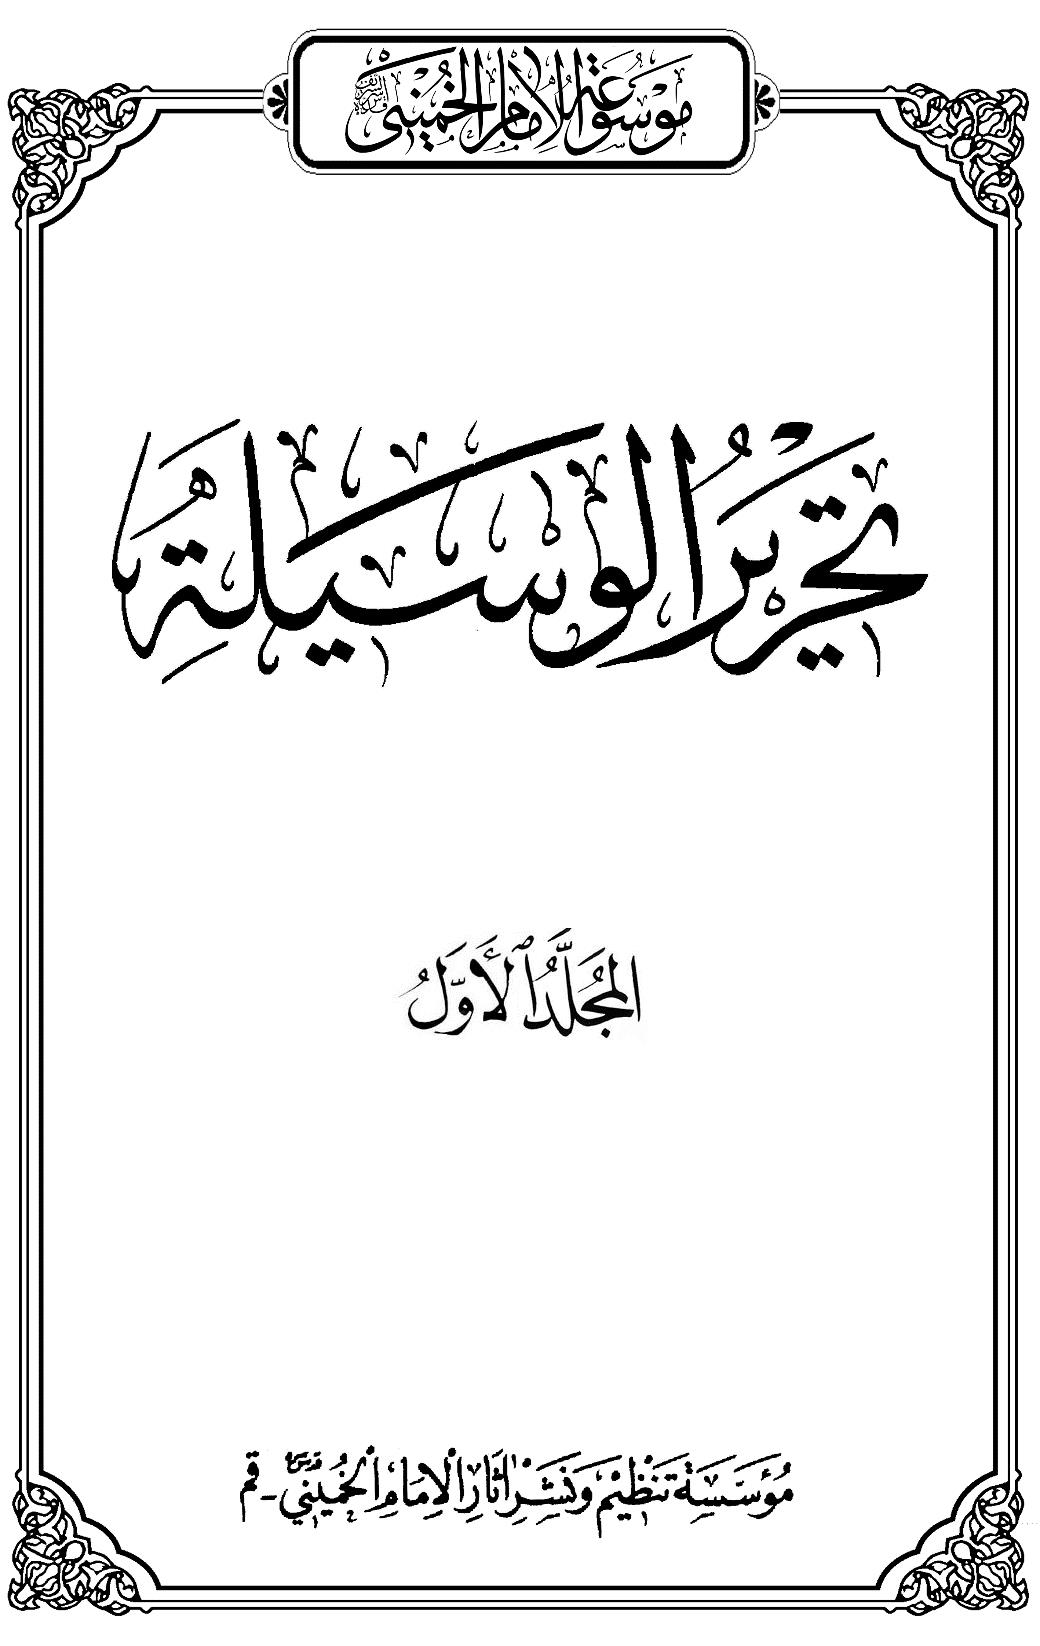 tahrir 1 copy